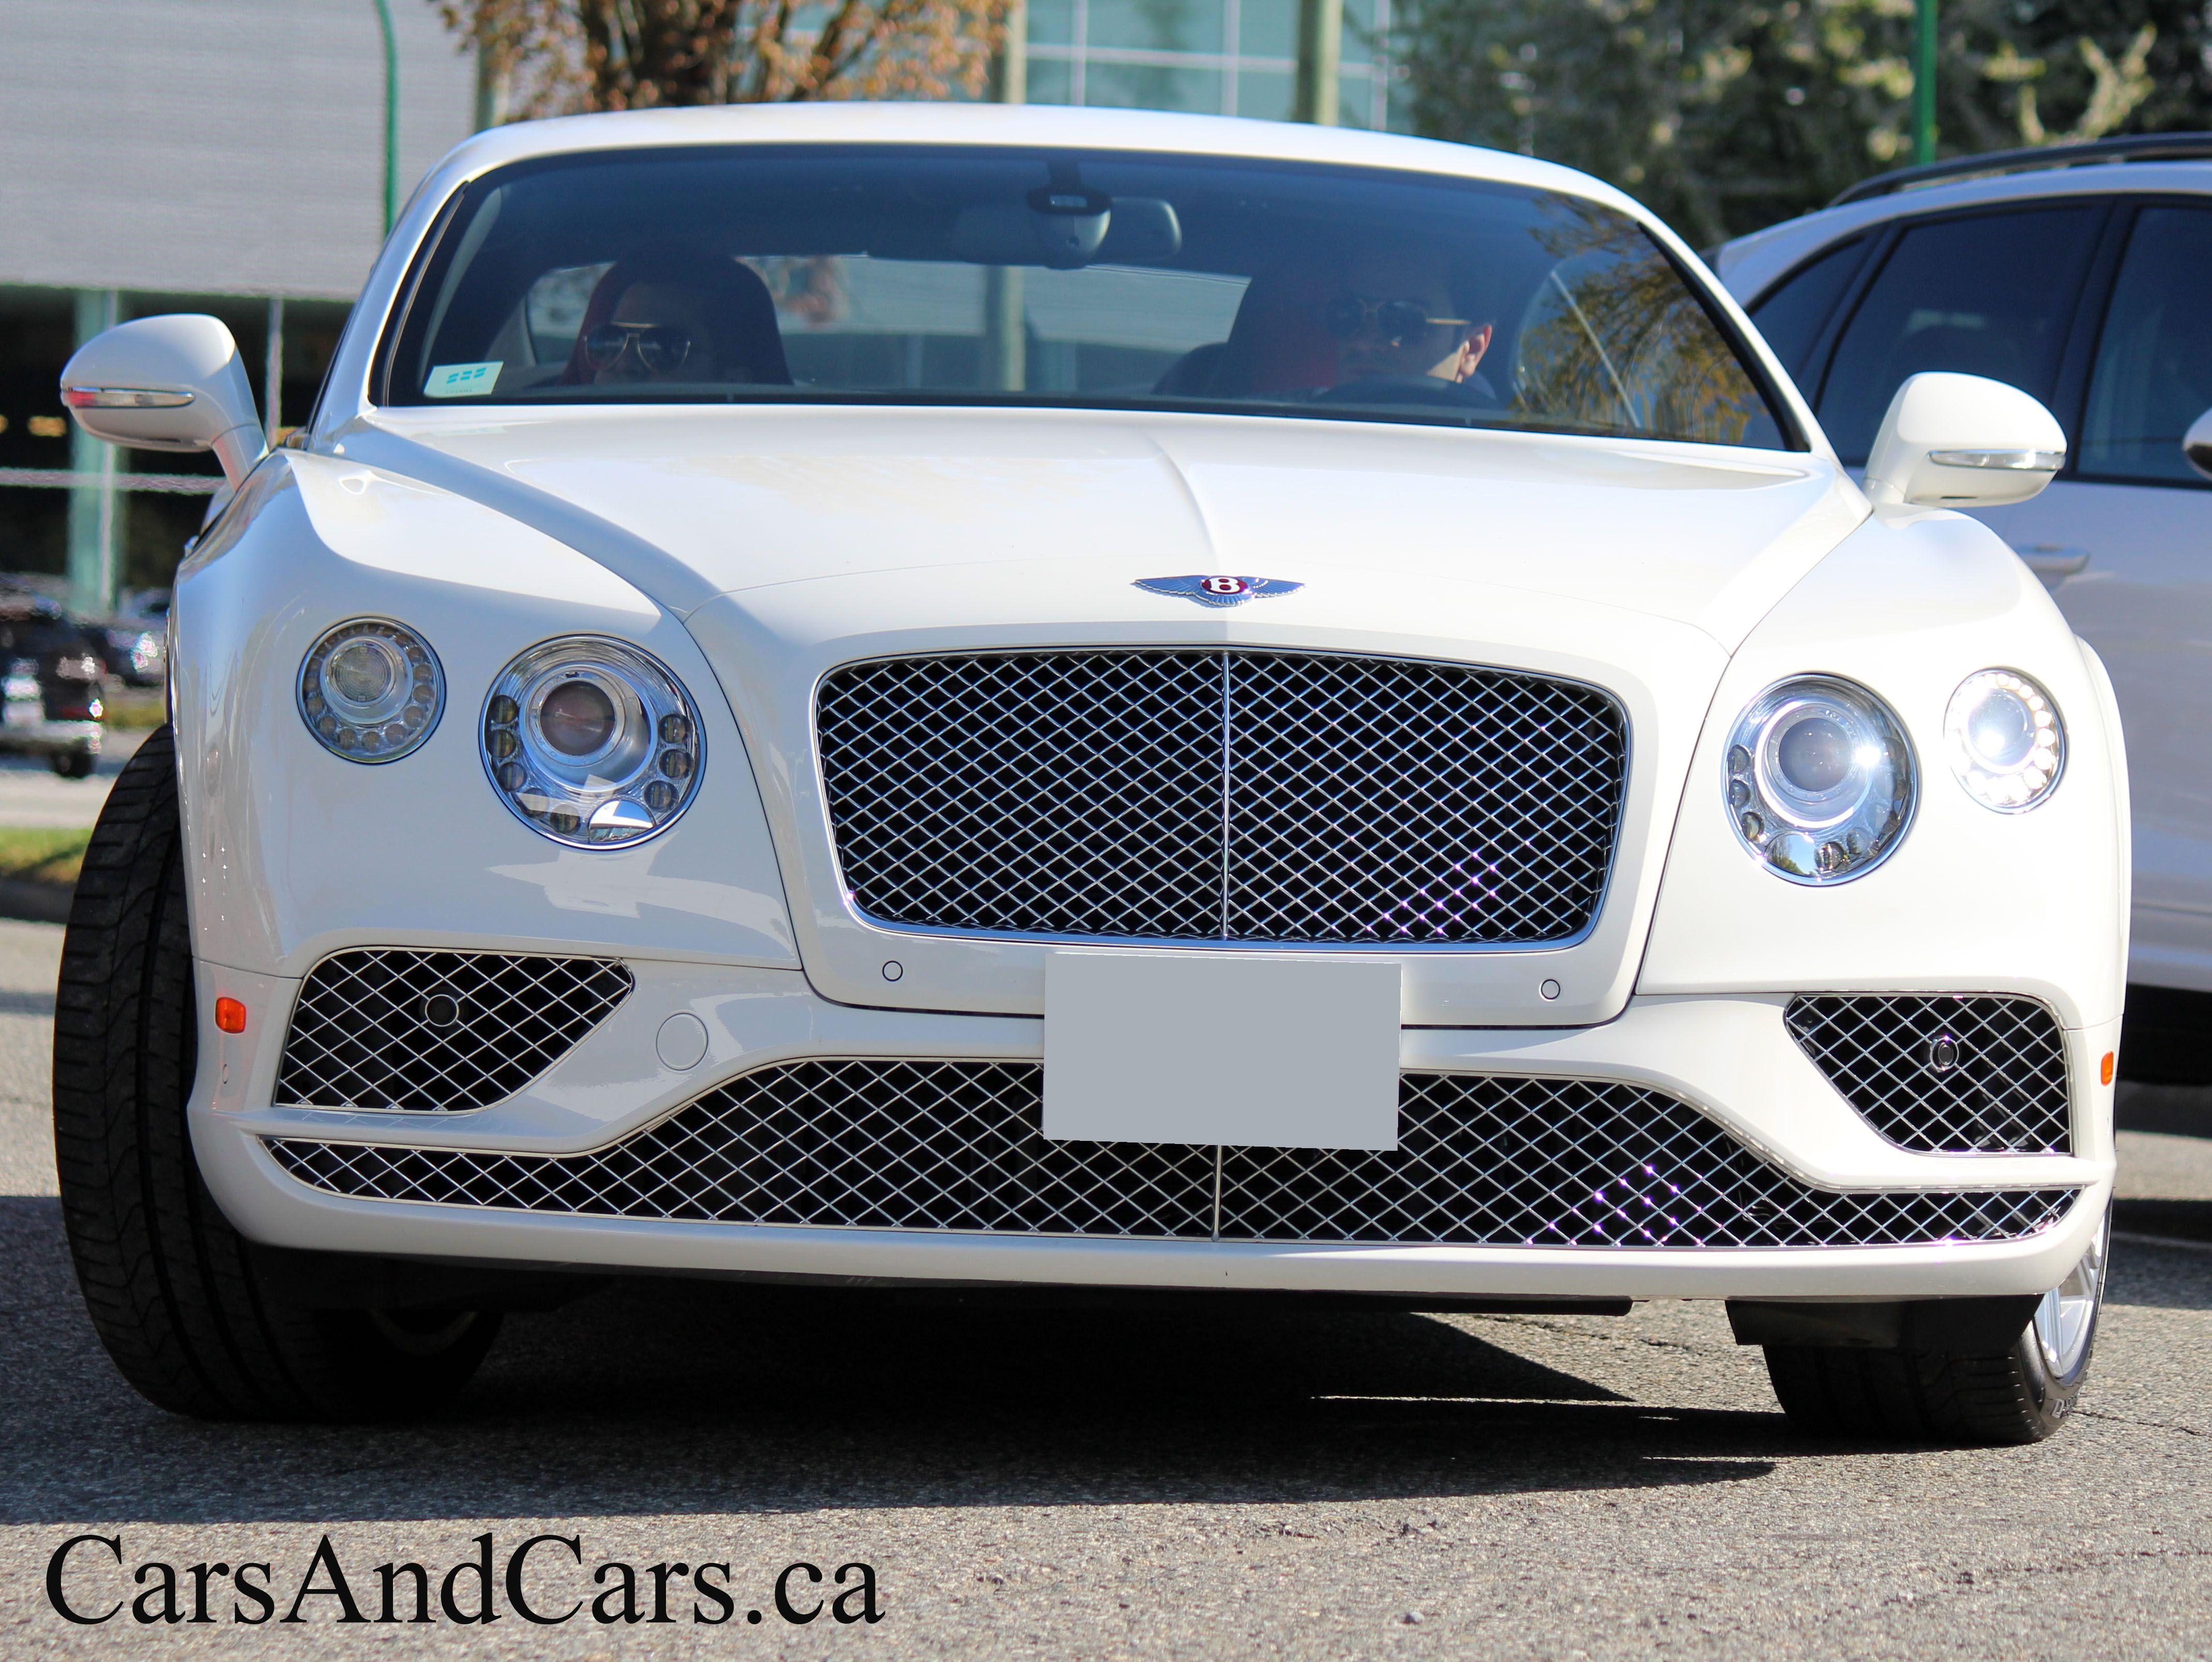 Bentley Continental GT Luxury CARS & BIKES Pinterest